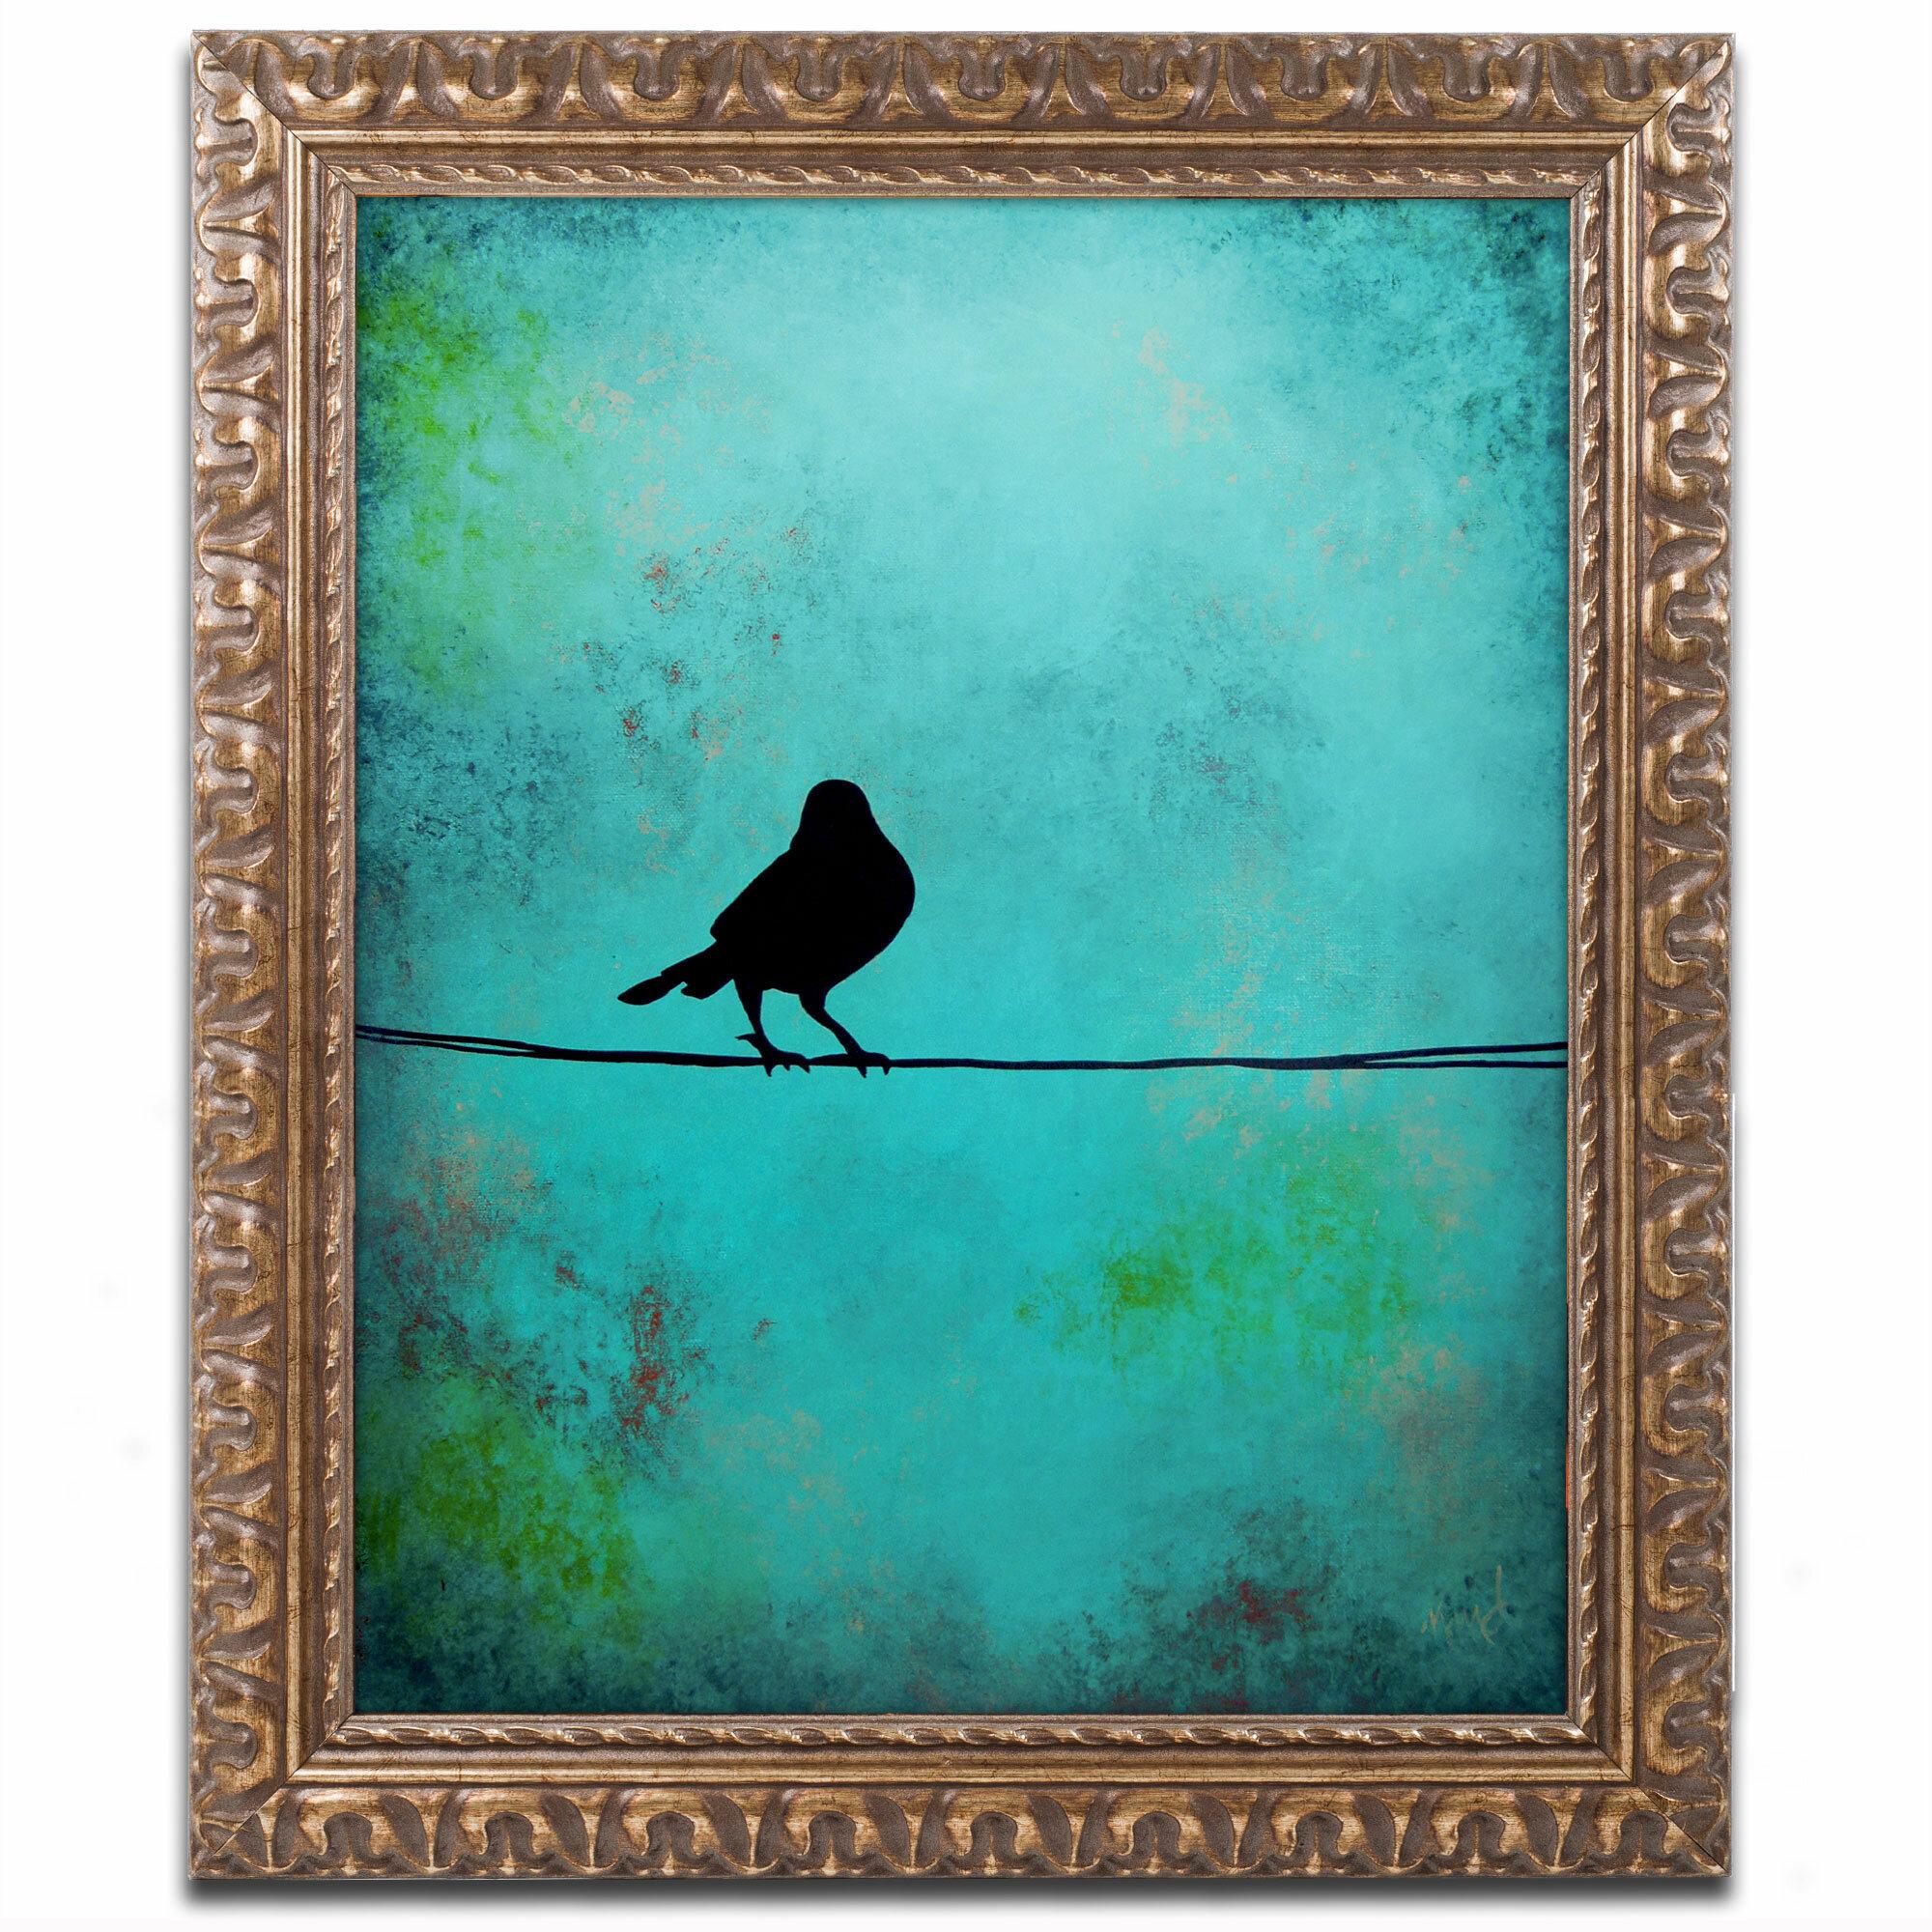 Trademark Art Bird S Attention Framed Painting Print On Canvas Wayfair